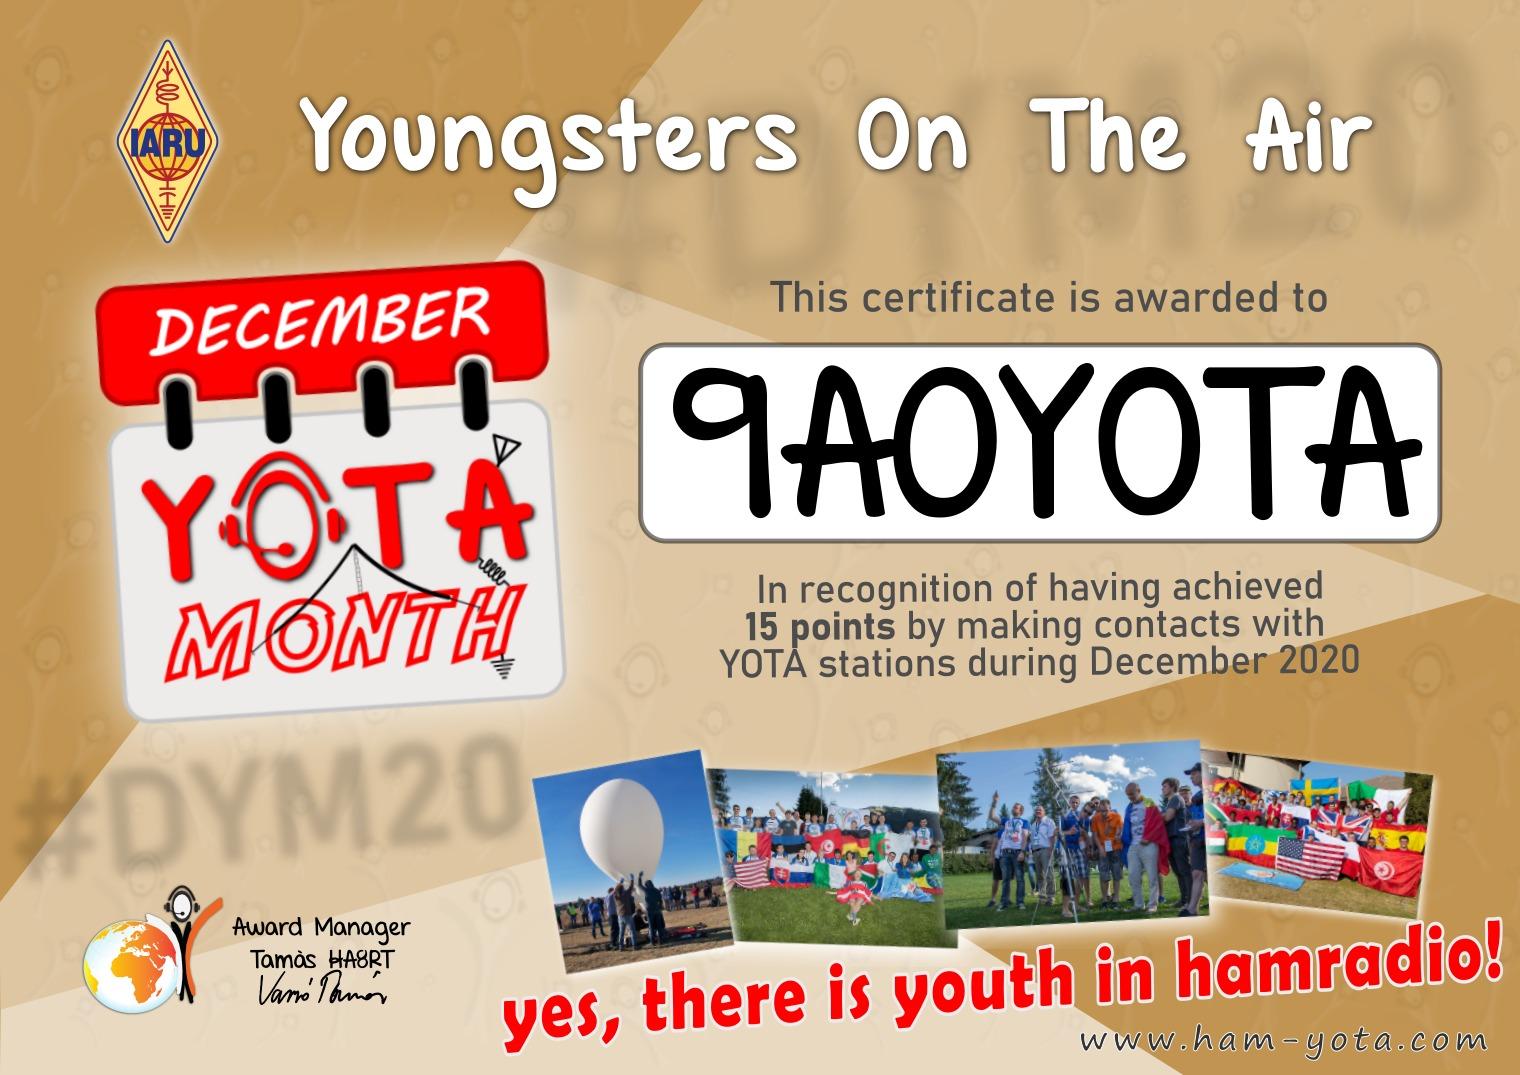 yota award 1